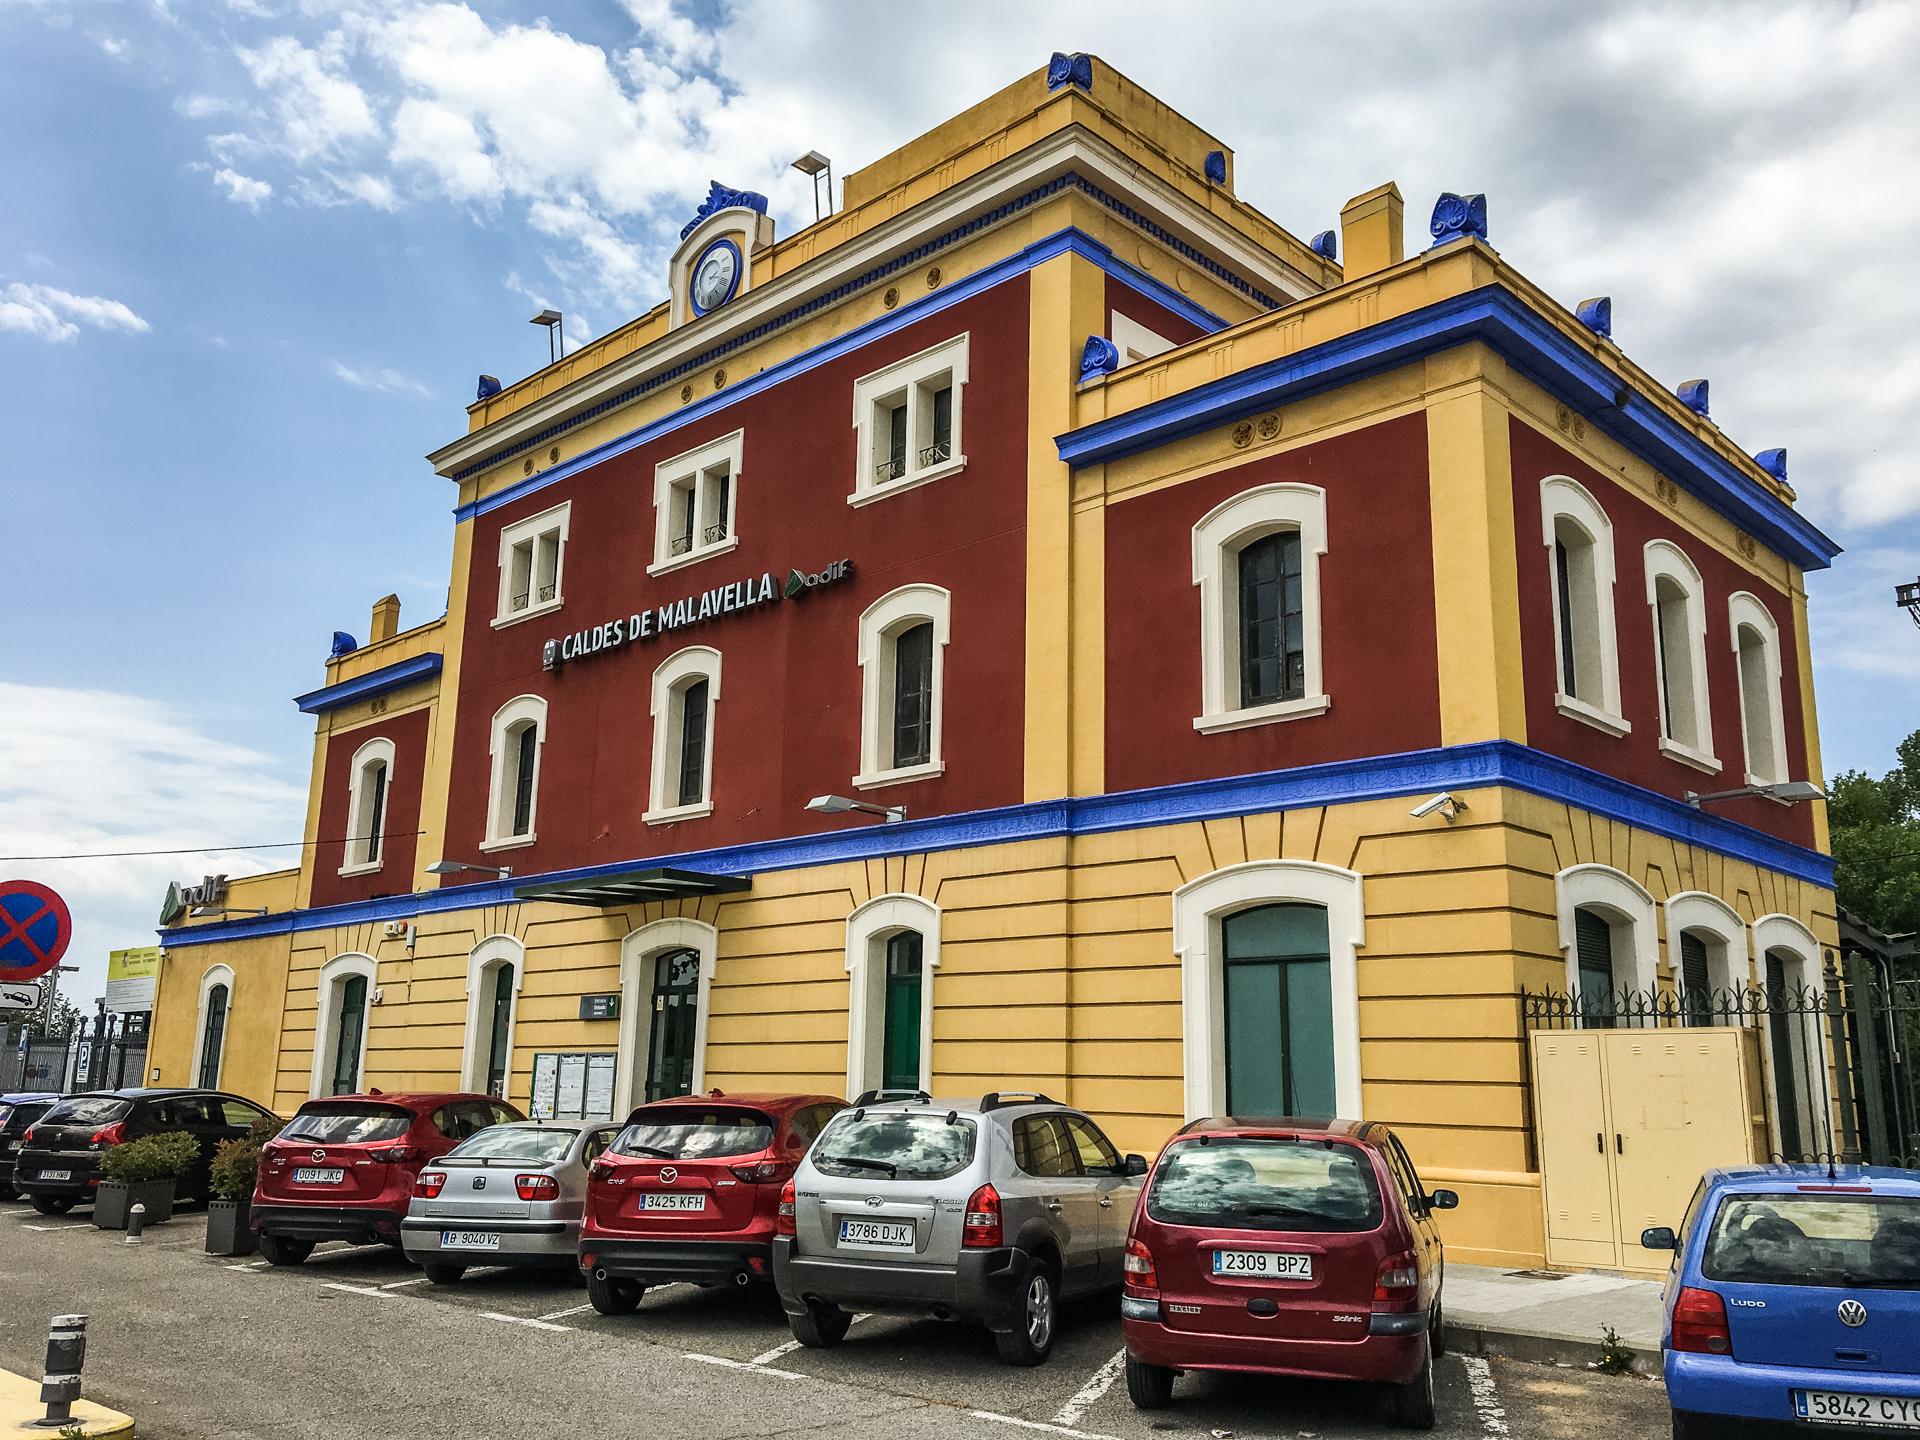 The colourful train station at Caldes de Malavella